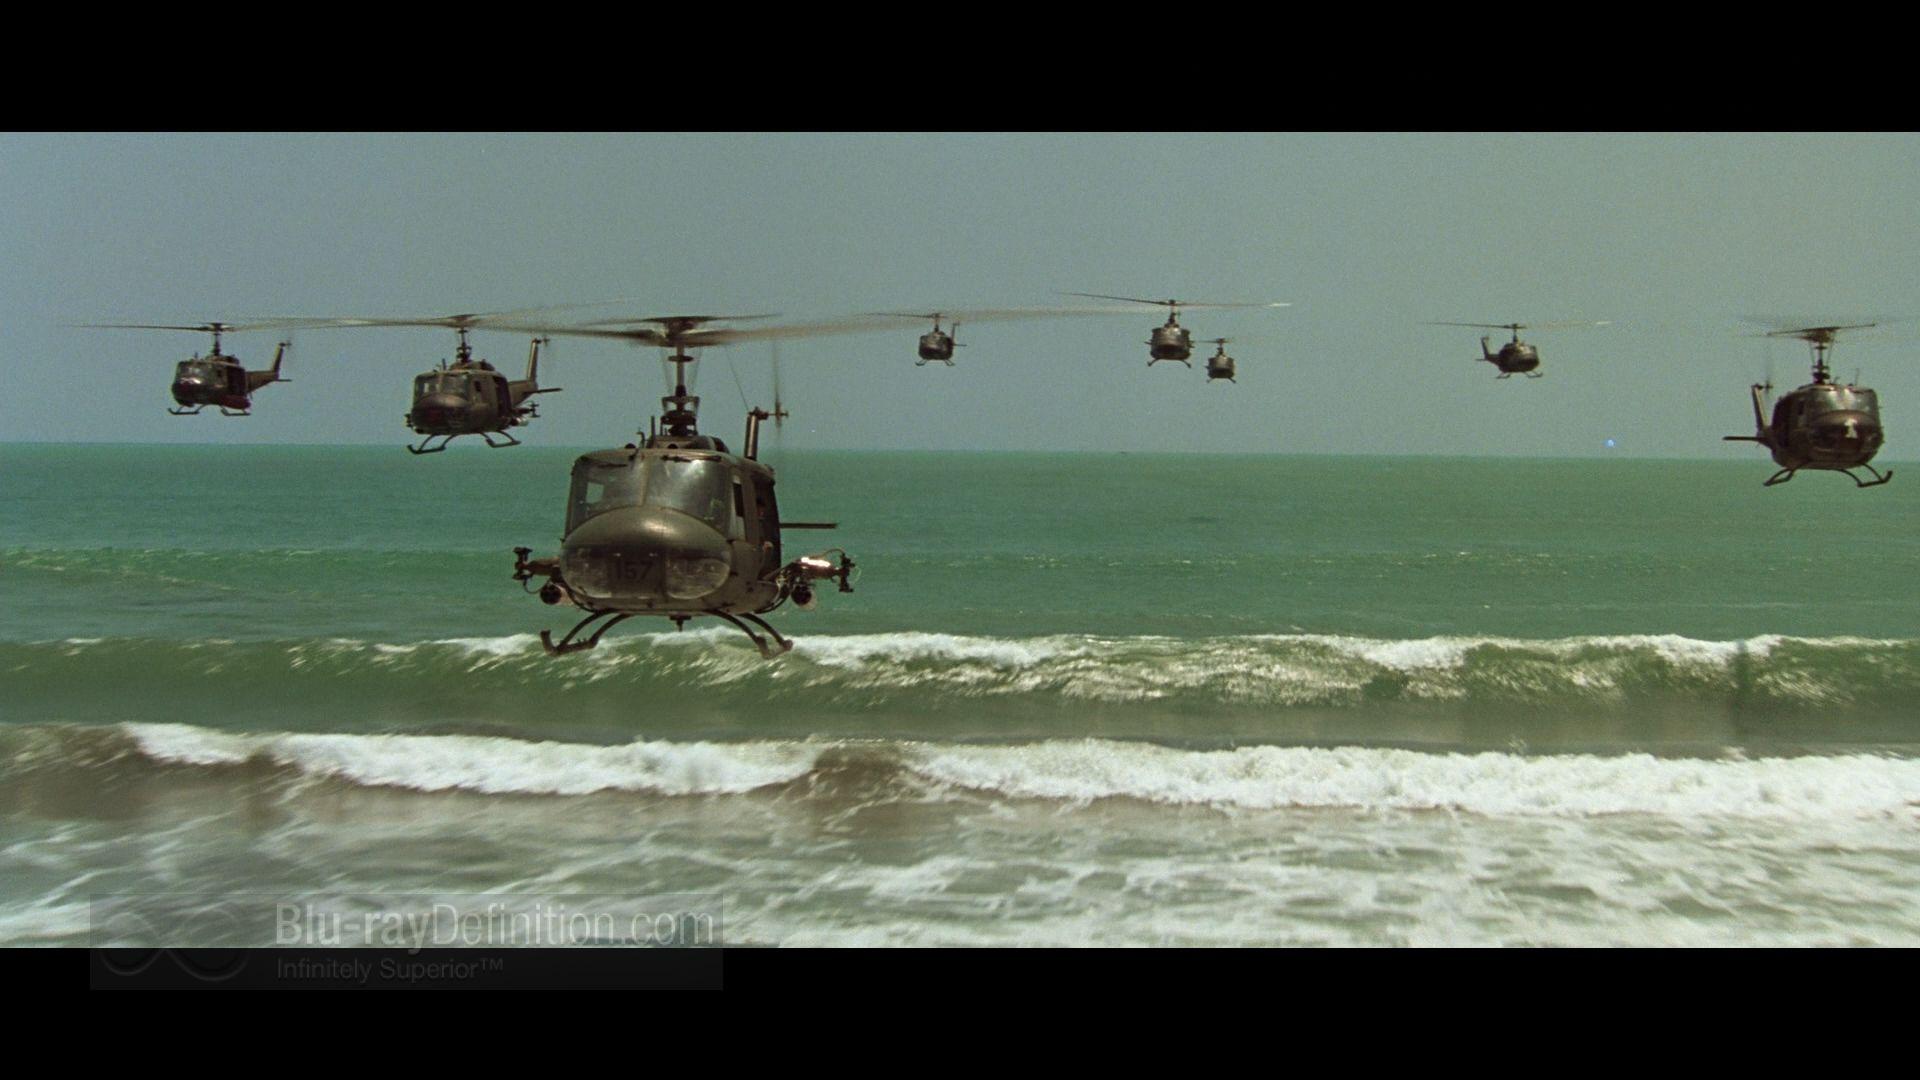 Apocalypse Now - AP Lit Skill Spotlight: Imagery, AP Lit & More